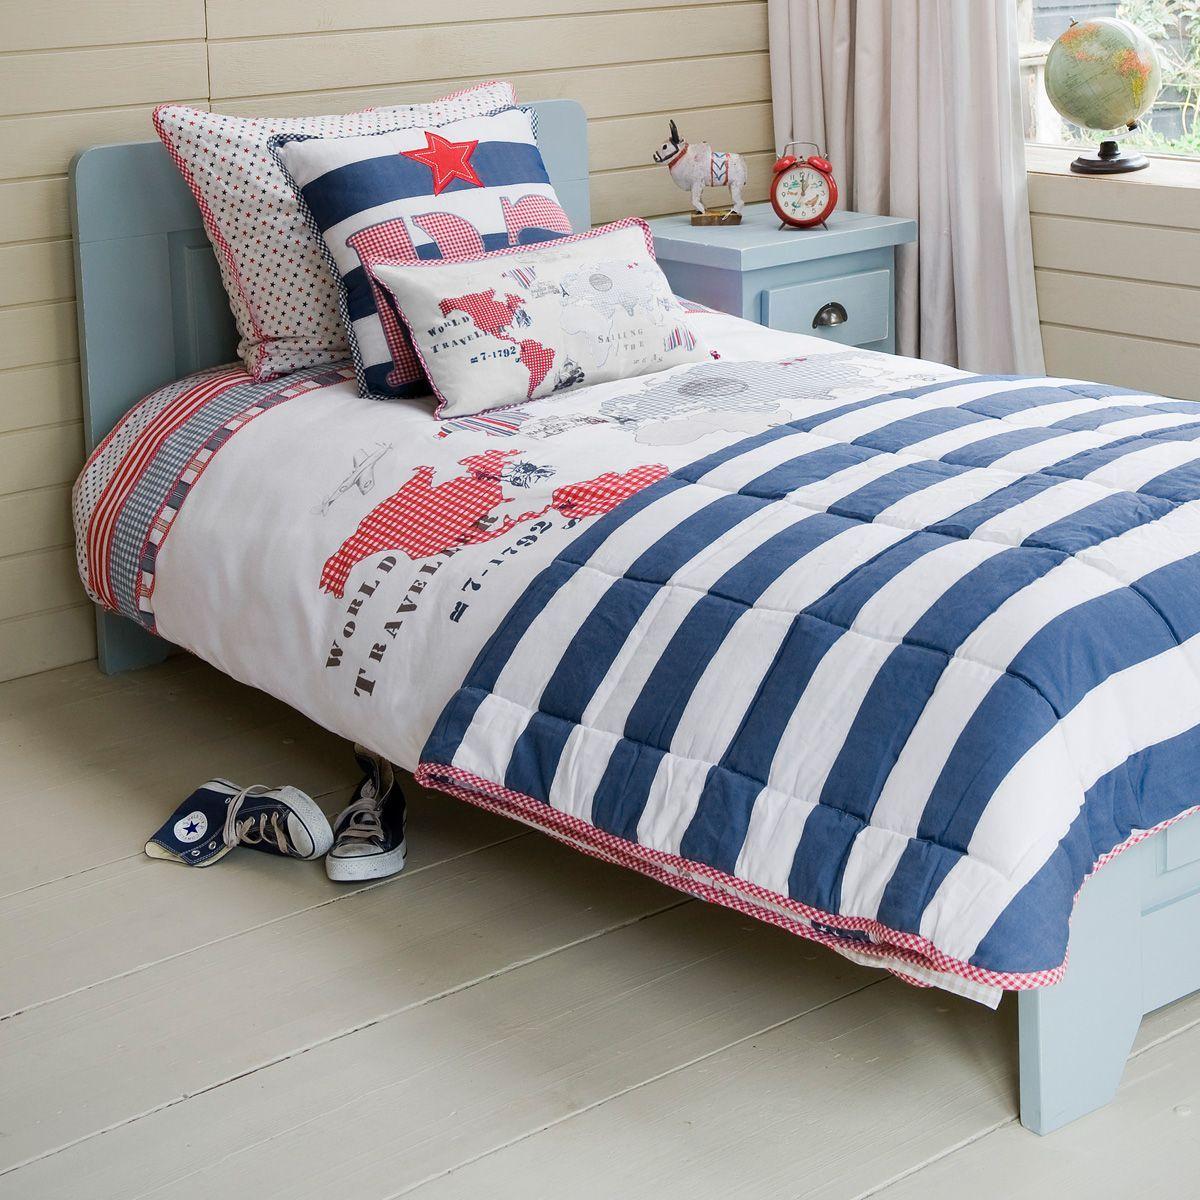 bettw sche standardgr e my blog. Black Bedroom Furniture Sets. Home Design Ideas